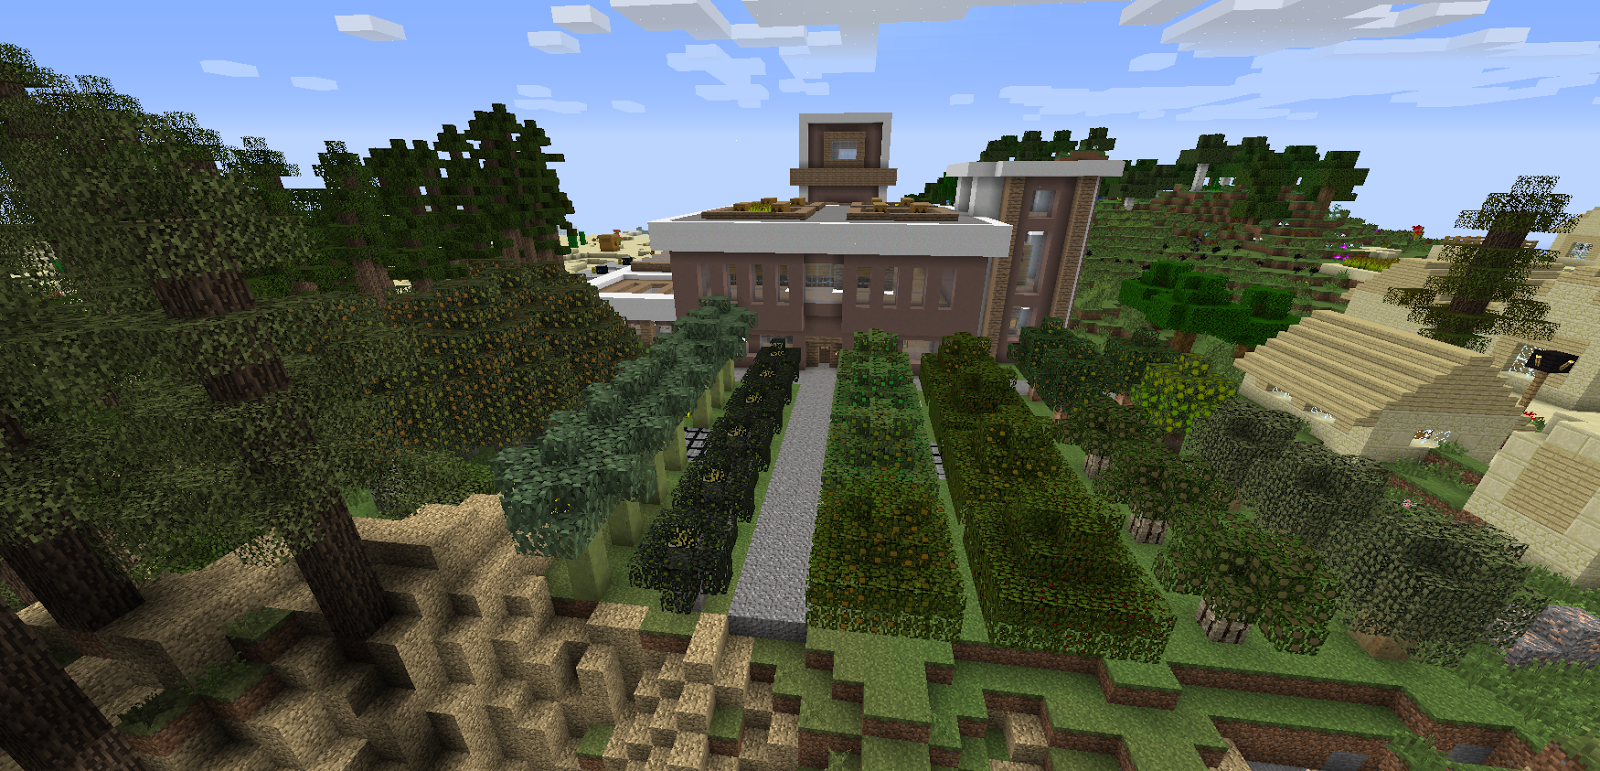 Modjo Minecraft: Tidy Orchard